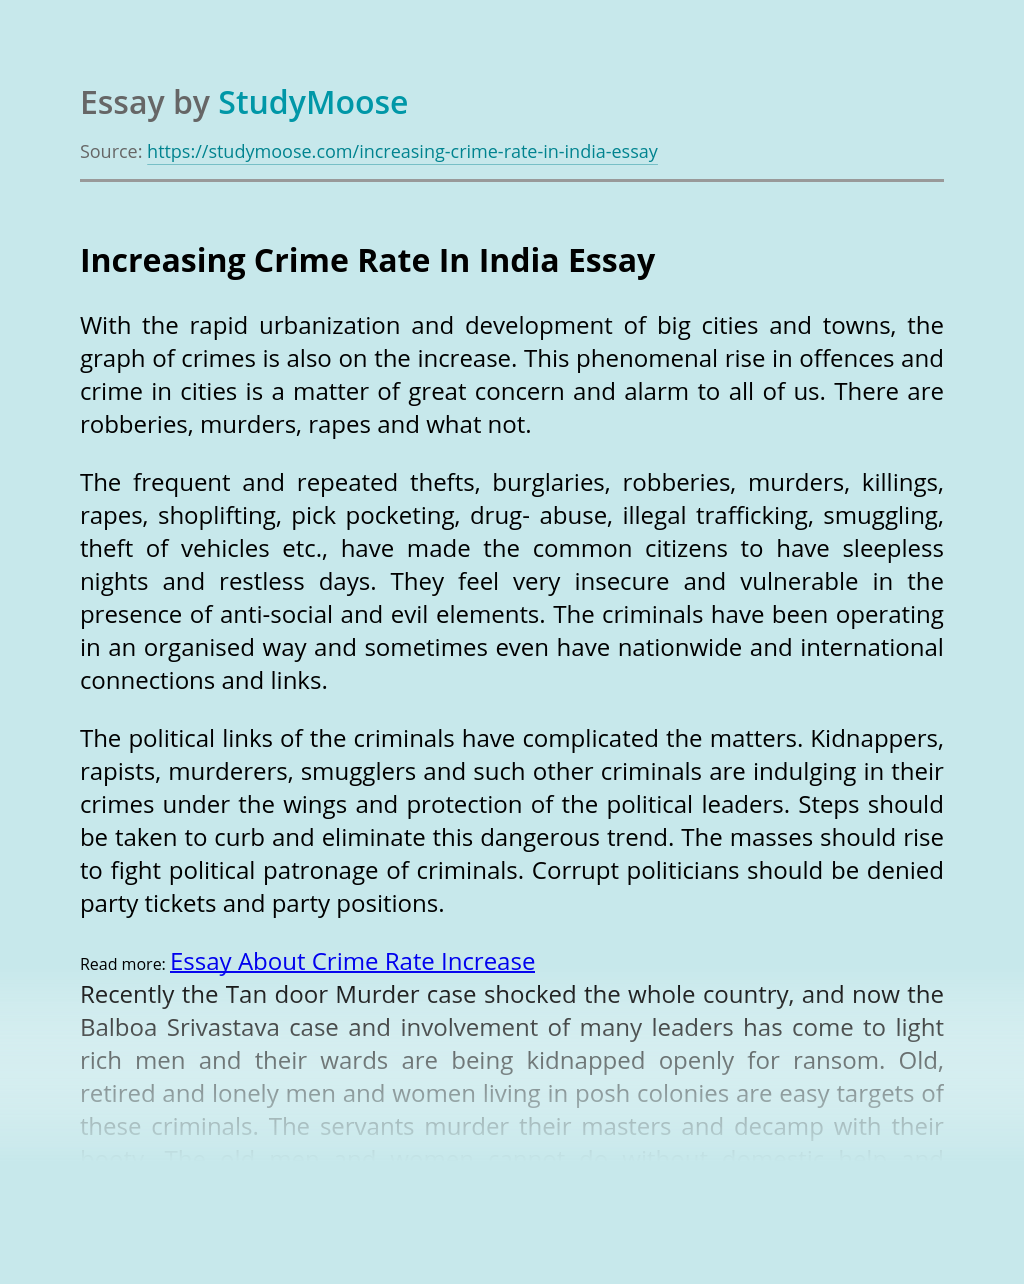 Increasing Crime Rate In India